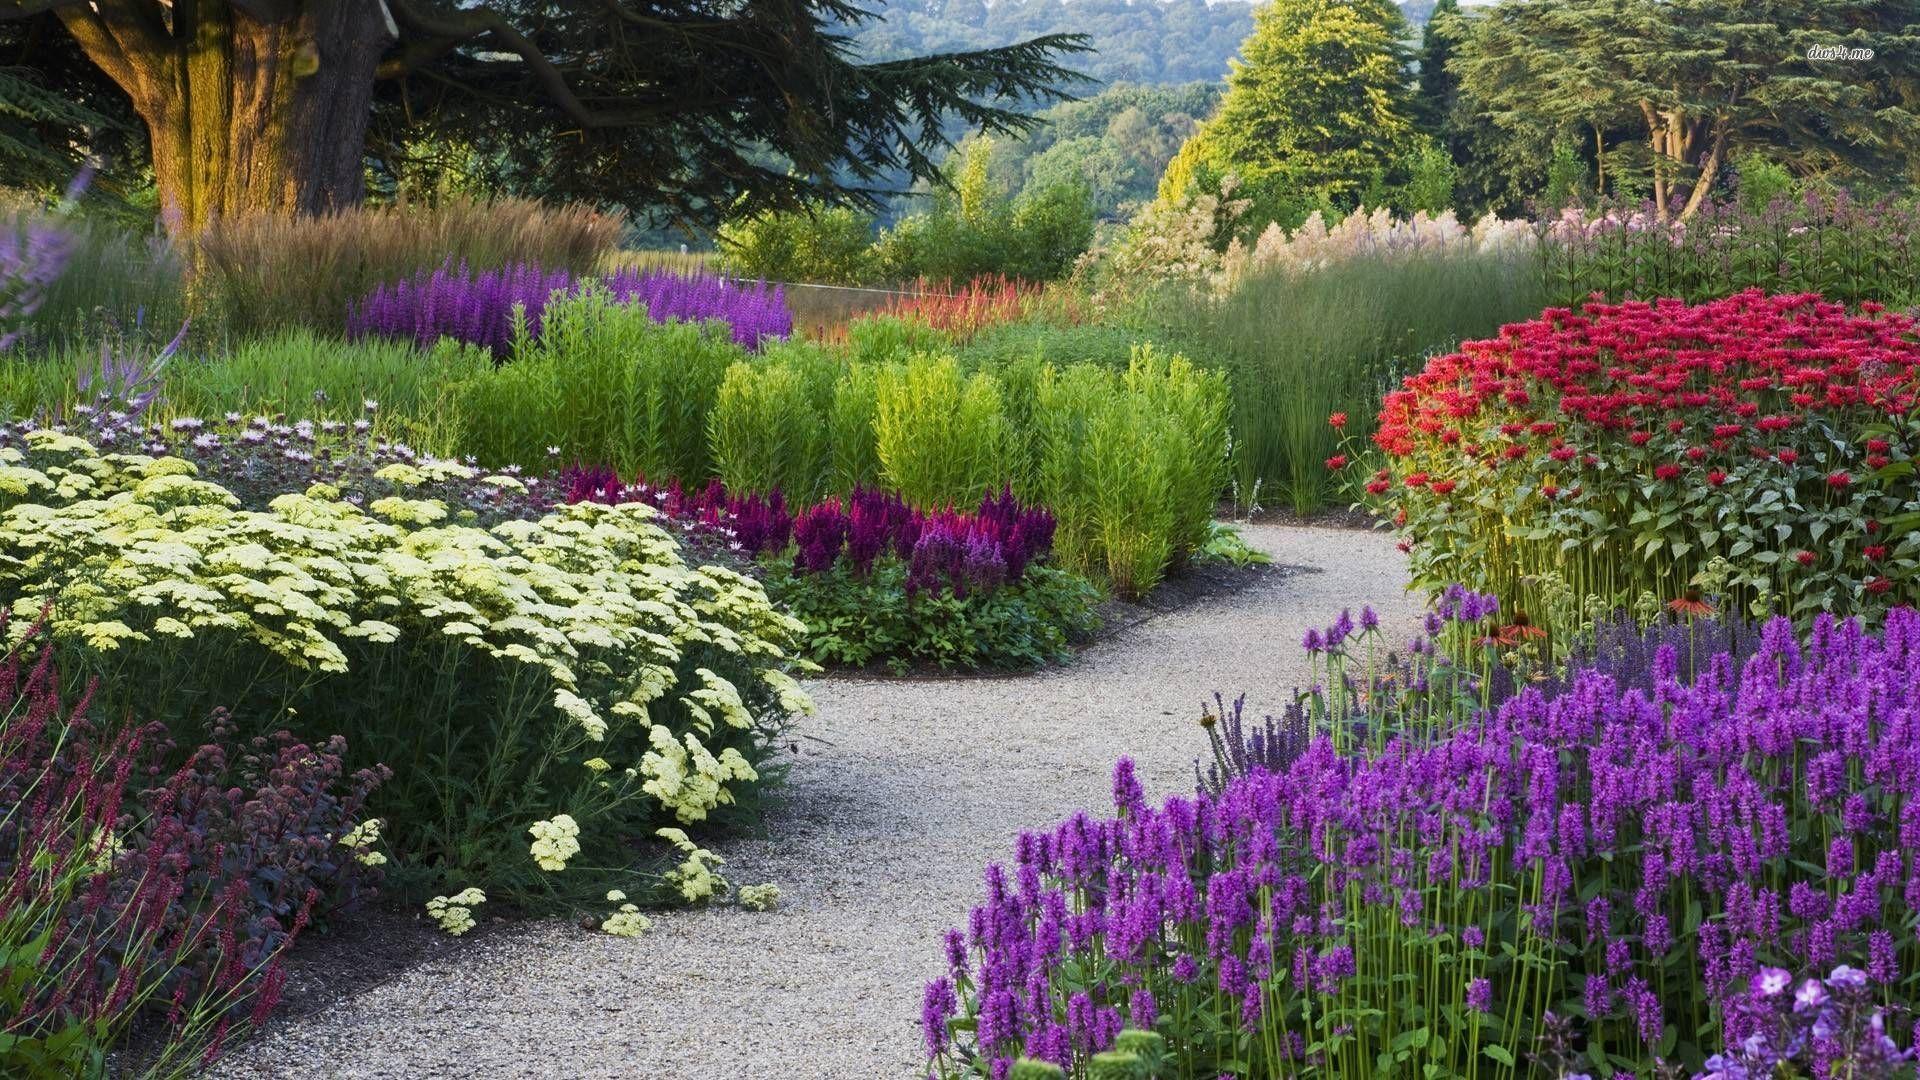 Flower Garden Wallpaper flower gardens wallpaper2 | fantastik manzaralar | pinterest